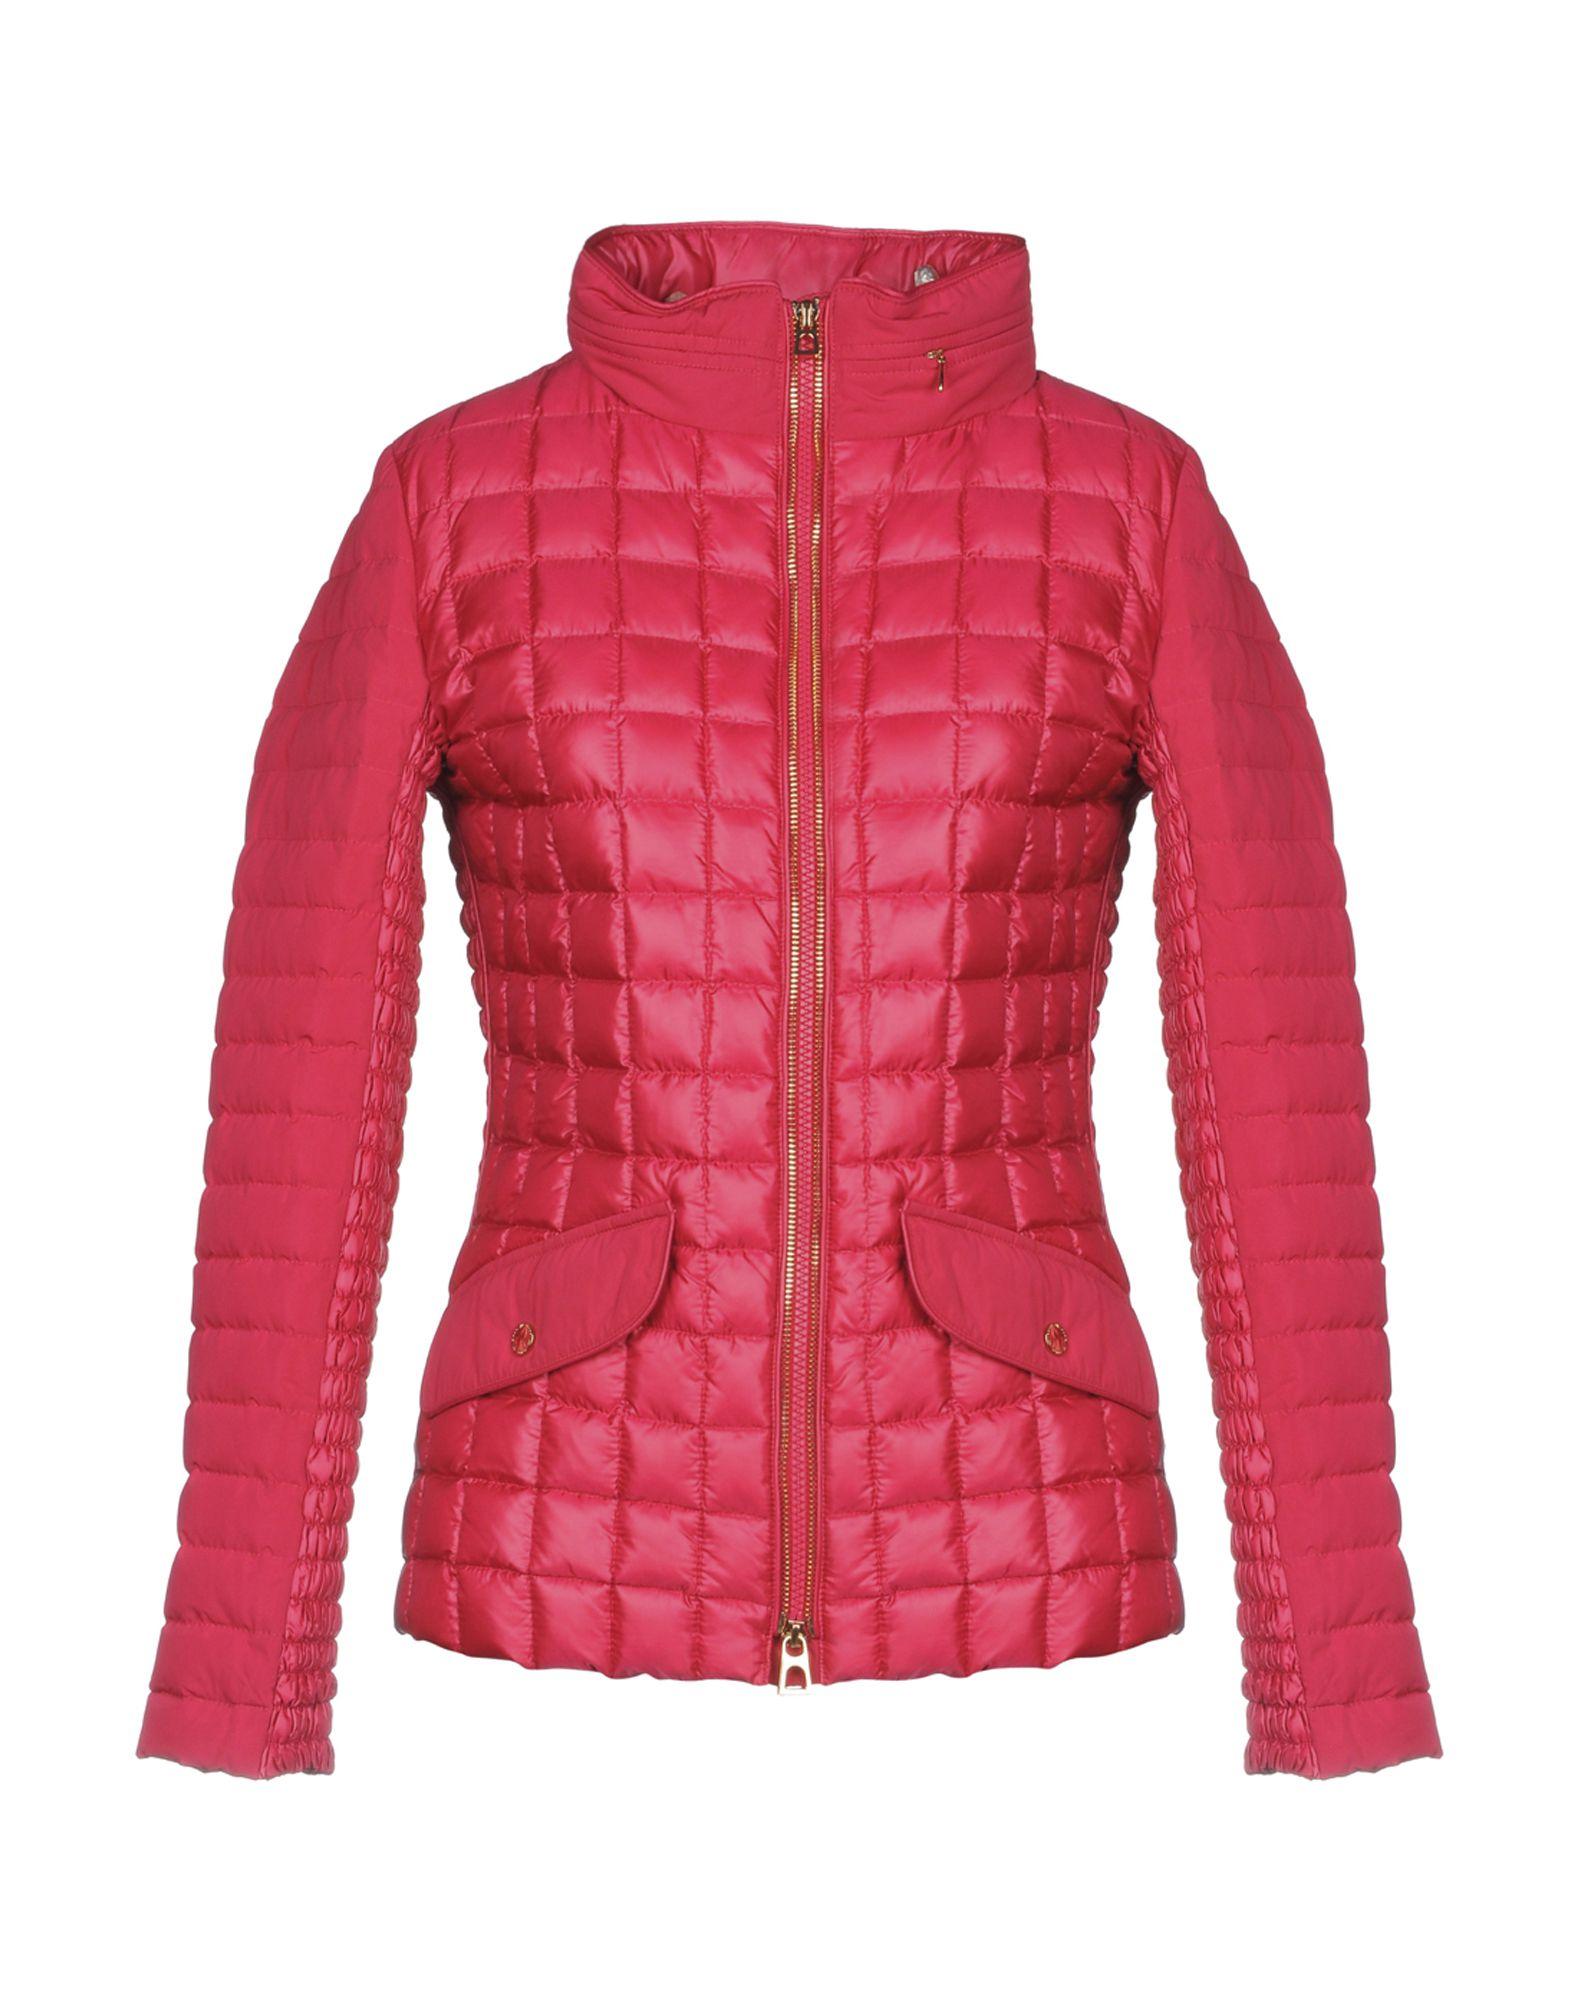 DIEGO M Down Jacket in Fuchsia